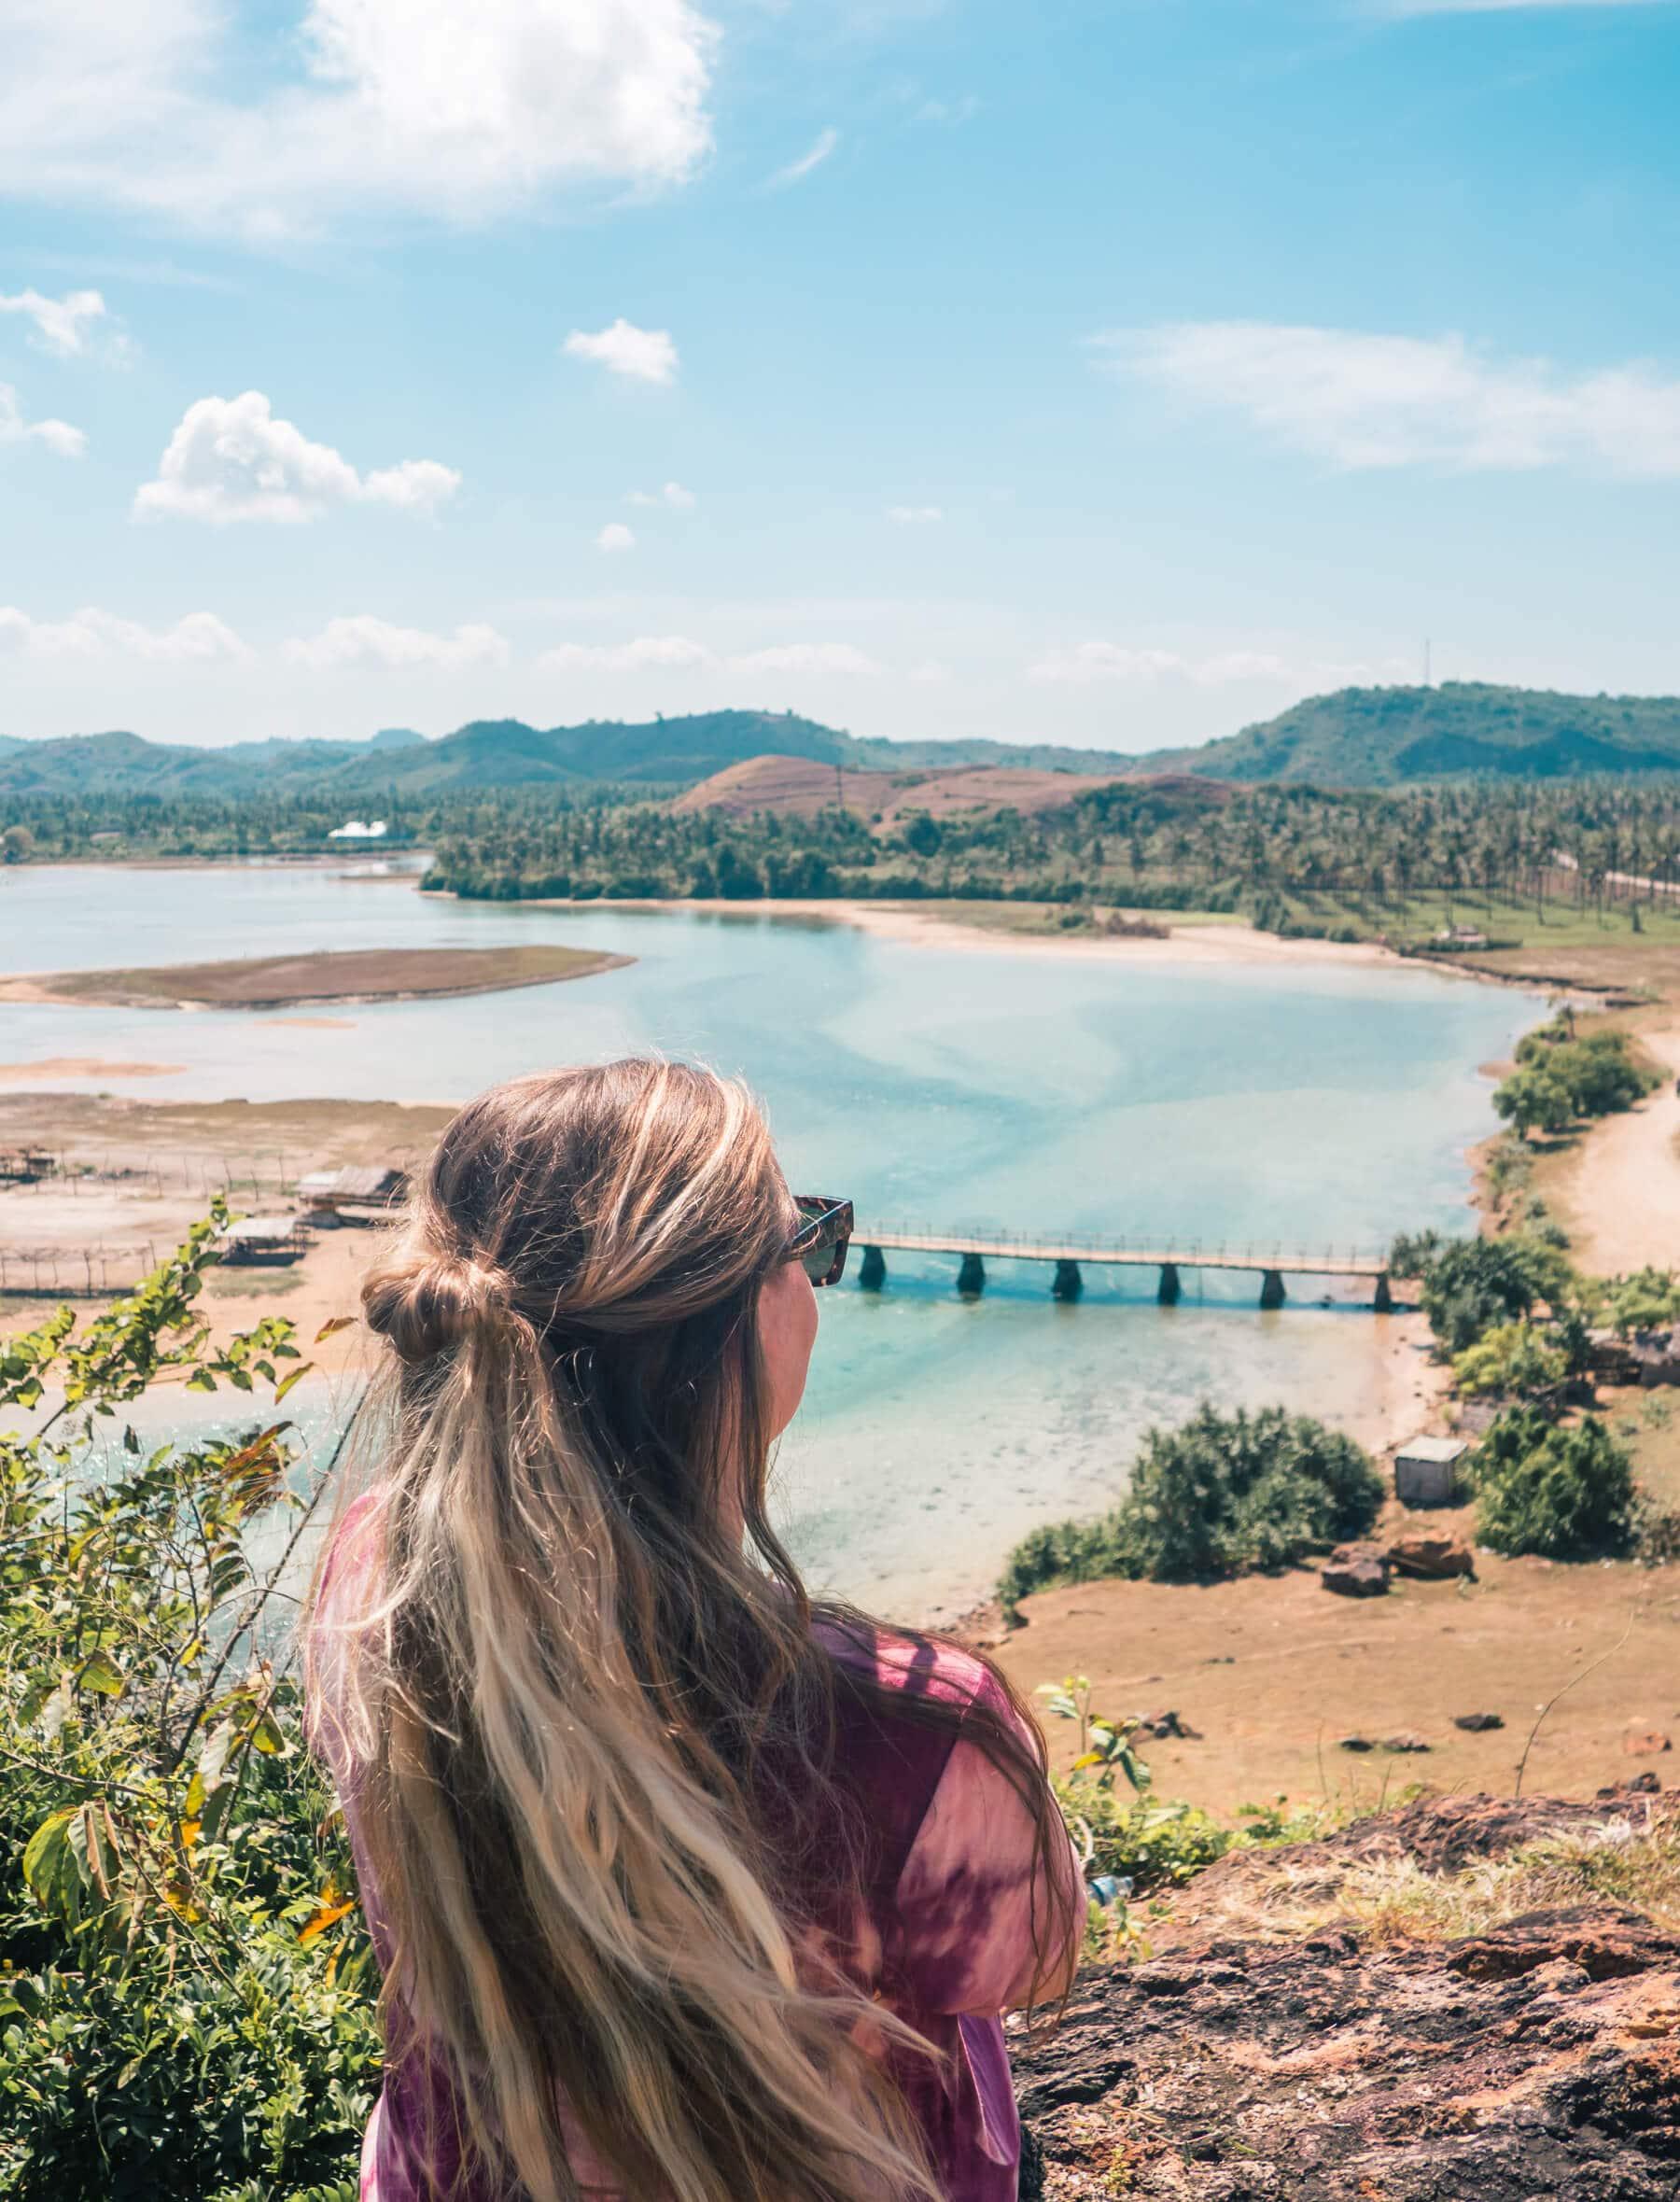 5 of the best views close to Kuta, Lombok - Seger Beach looking out over a gorgeous inlet and Patung Putri Mandalika (Statue Of Princess Mandalika)